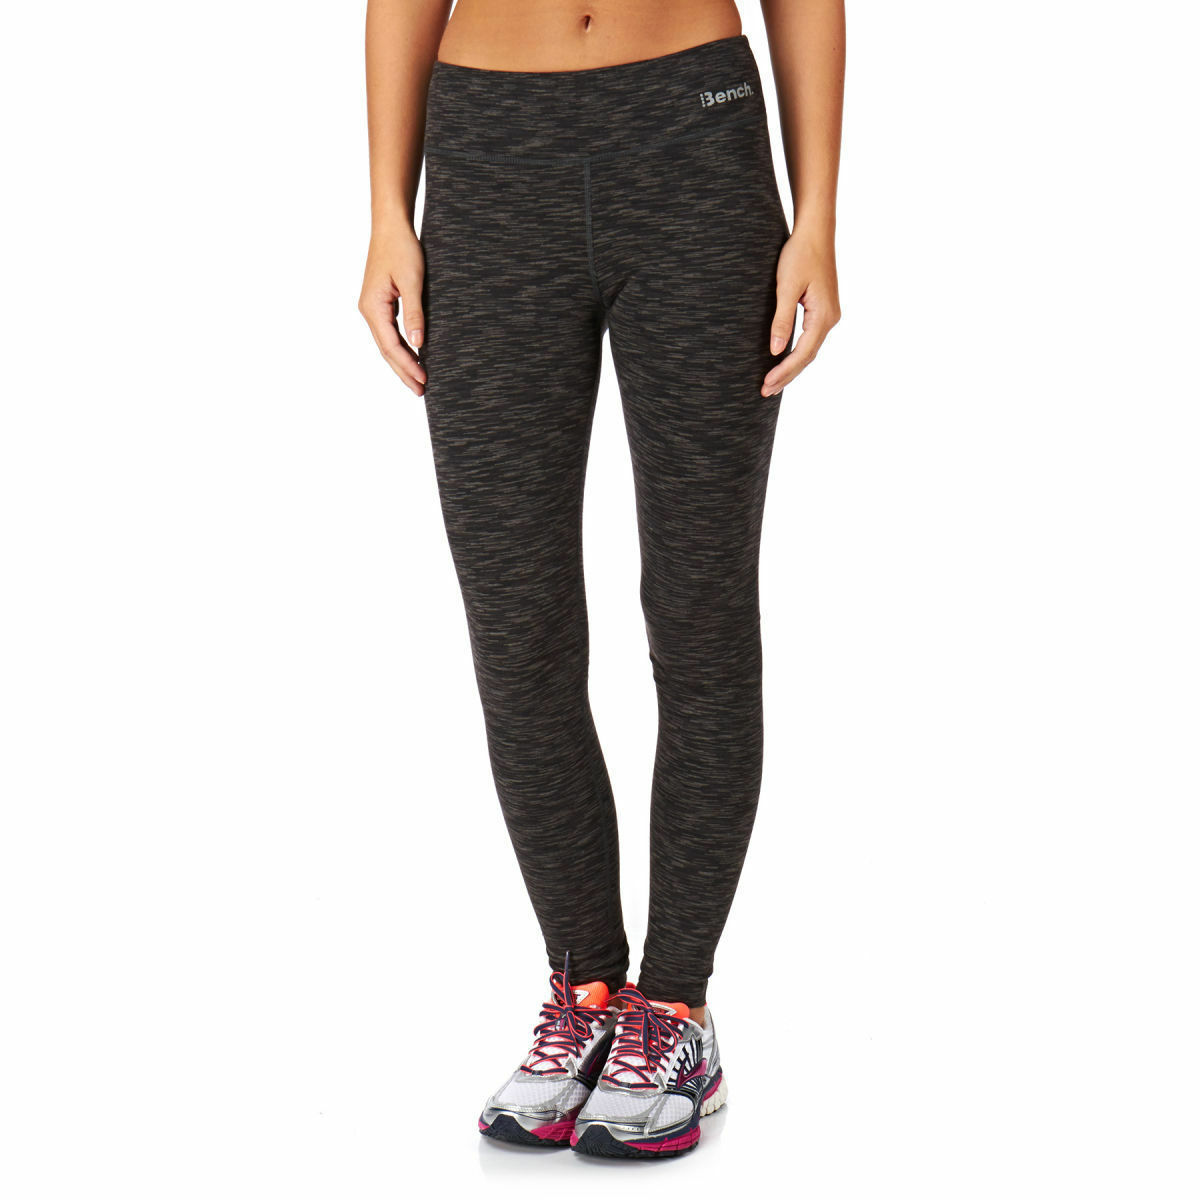 Bench Femmes Noir Geai Bruyère Marne Baddah Leggings Fitness Yoga Pantalon Nwt